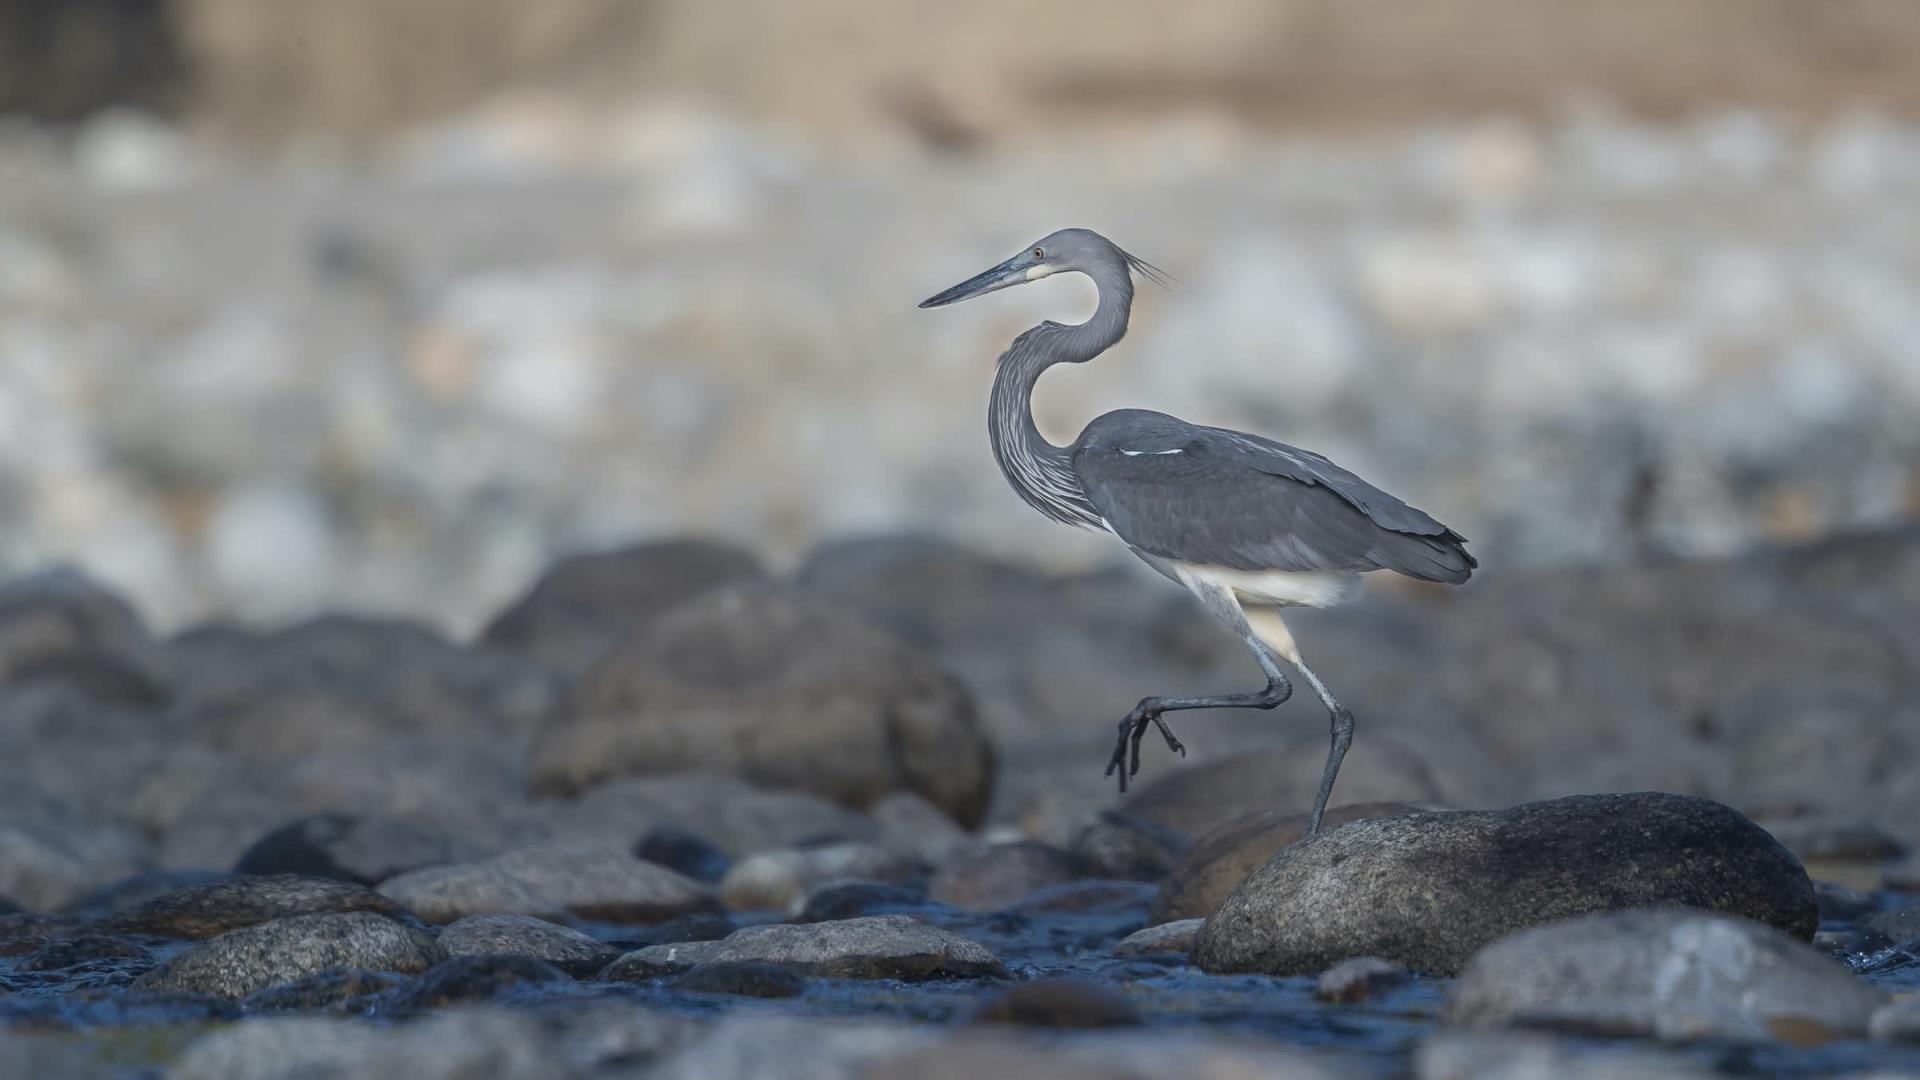 White-bellied Heron: Facts, Diet, Habitat